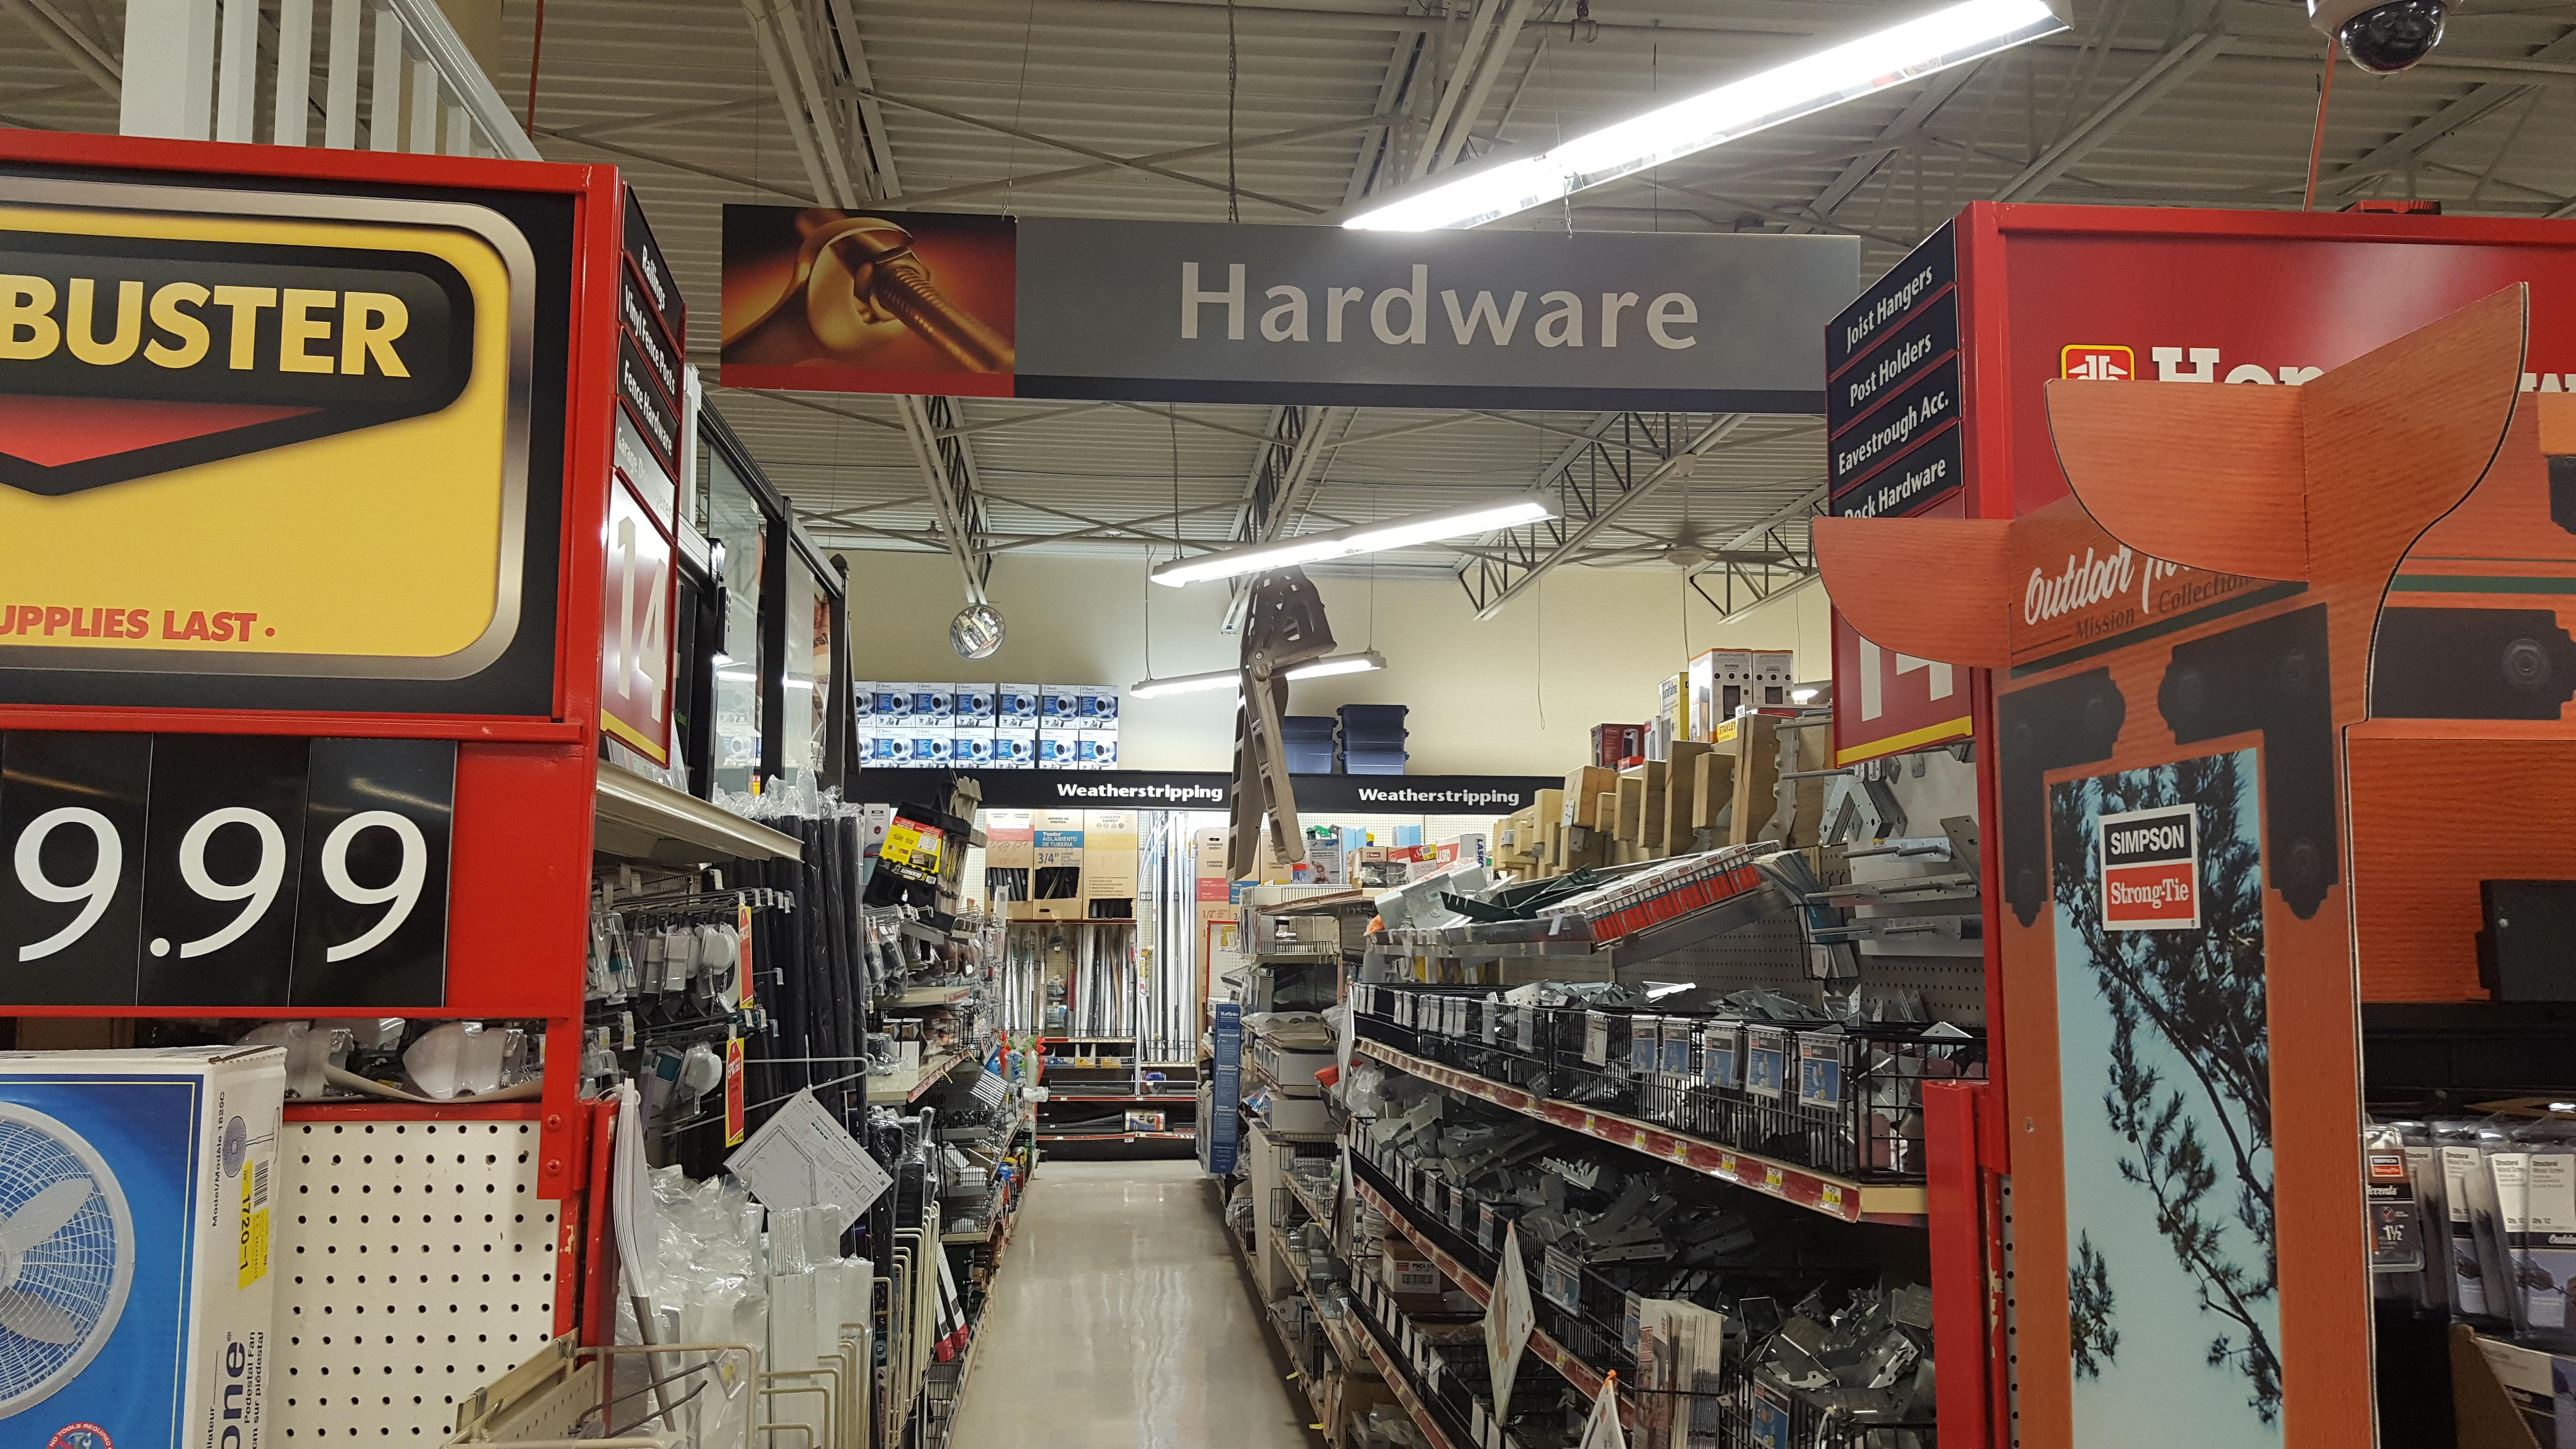 Hardware Department